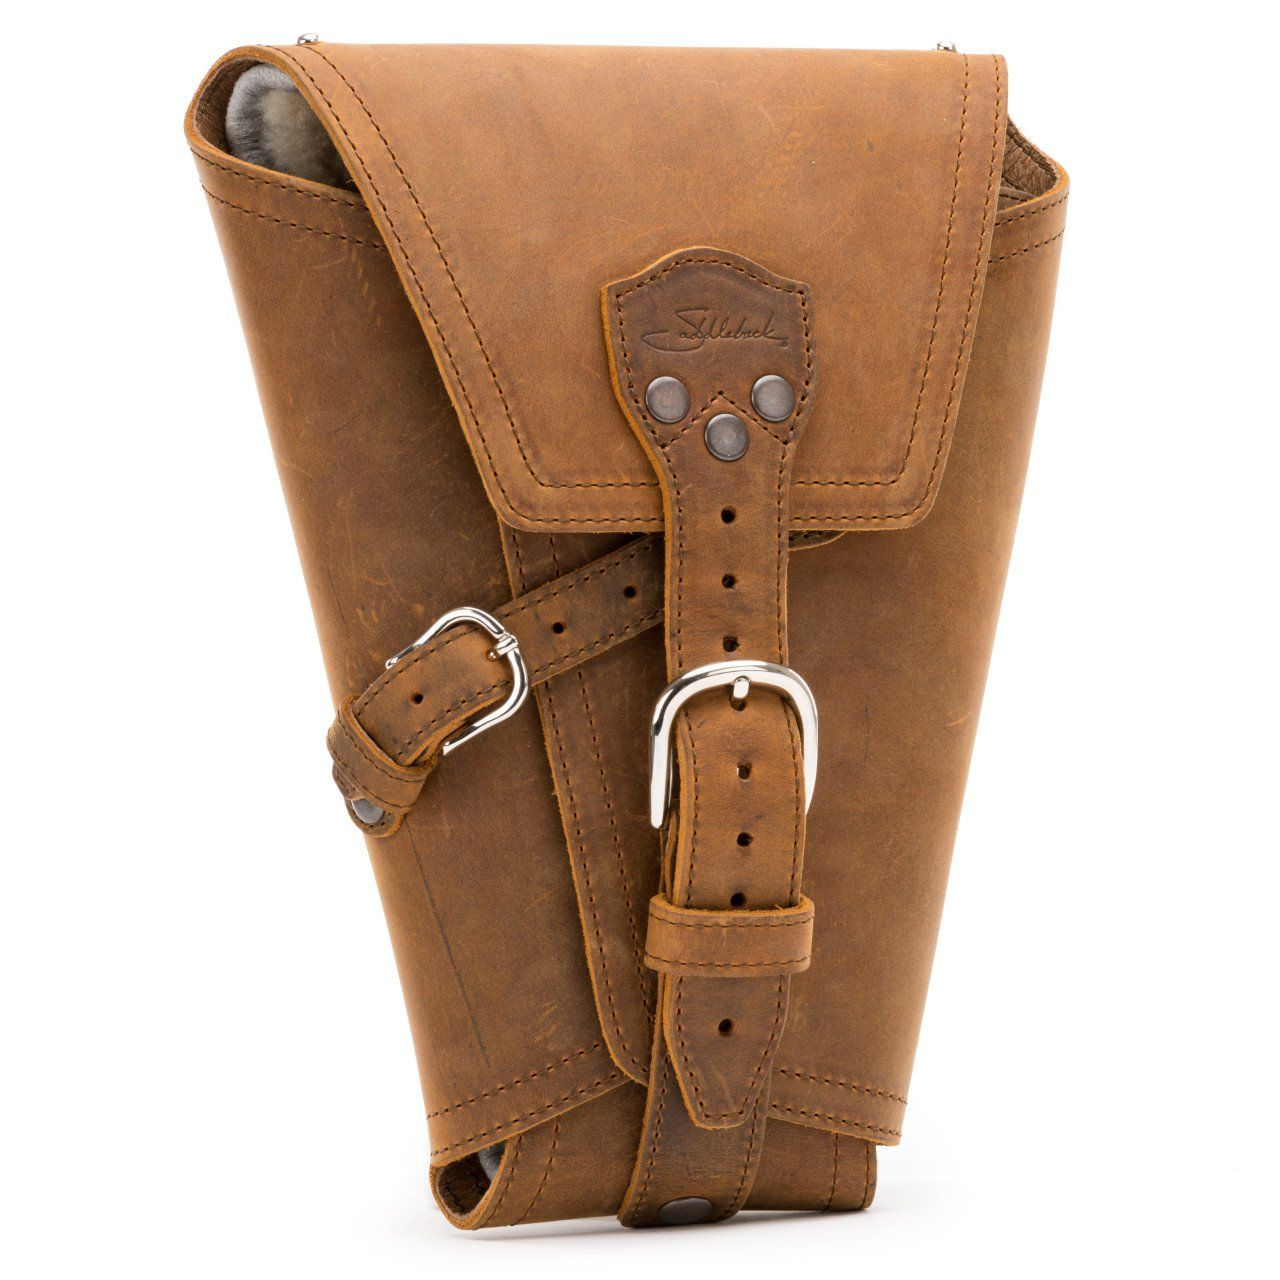 leather pistol wrap medium in tobacco leather | Koza | Pinterest